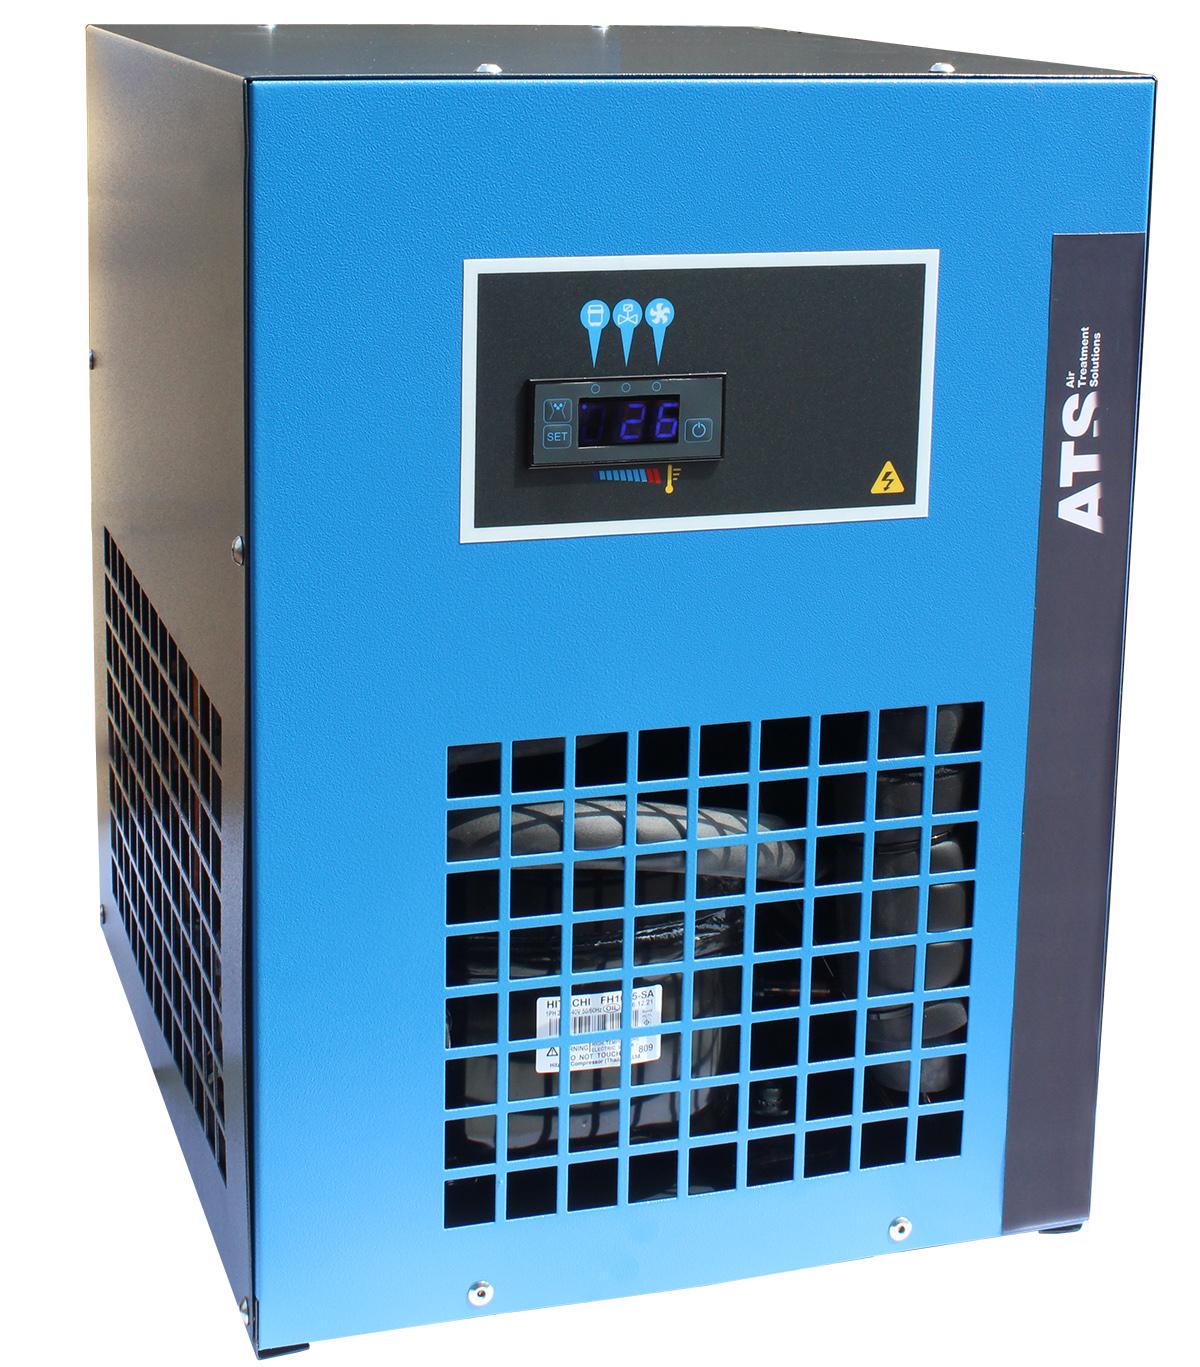 Chladnička ATS DO 78 ISO4 3ST Sušič